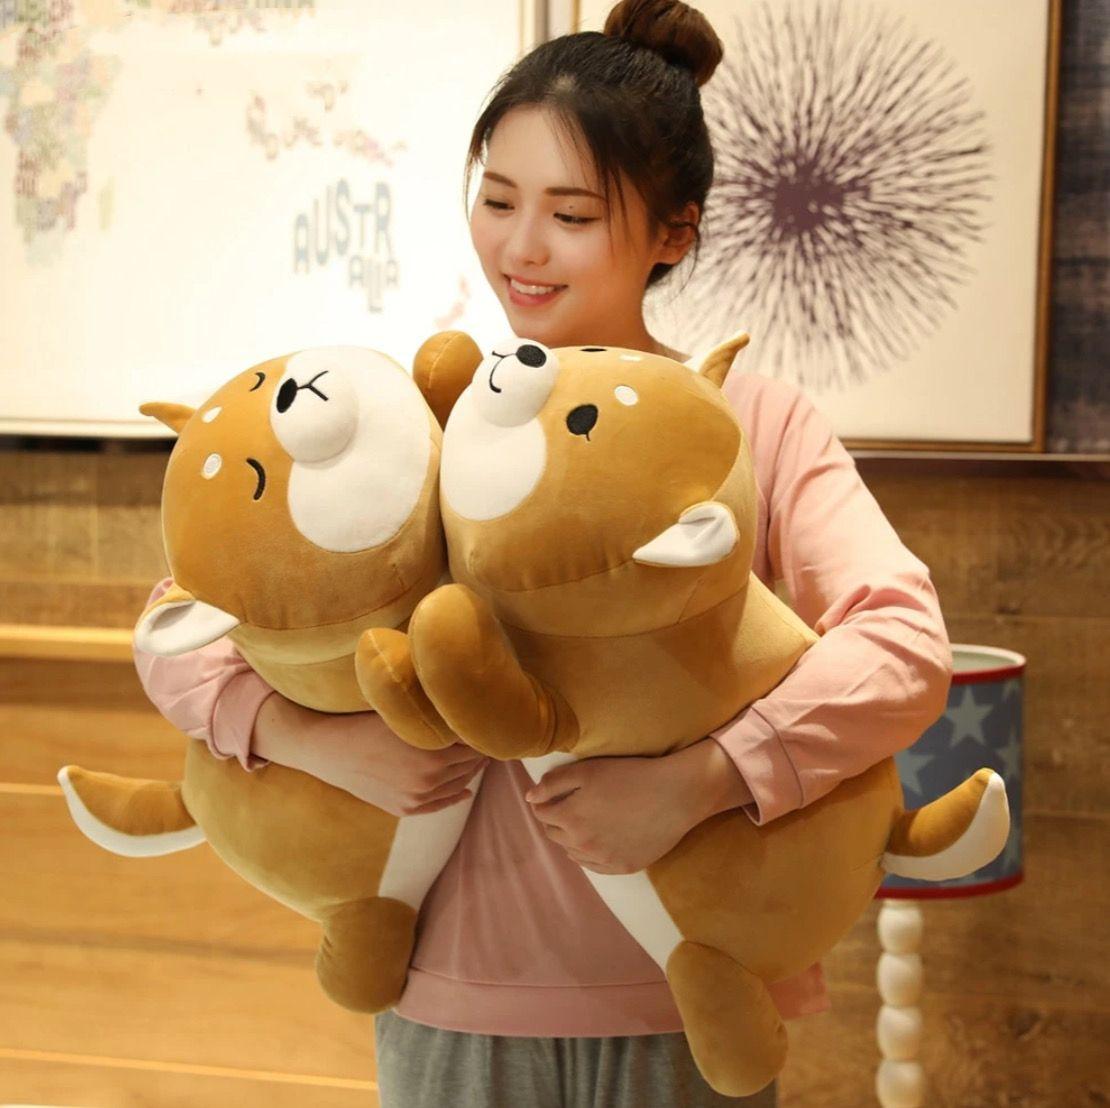 Lying Shiba Inu Plush Pillow Dog Plushie Cushion In 2020 Cute Corgi Shiba Inu Animal Dolls